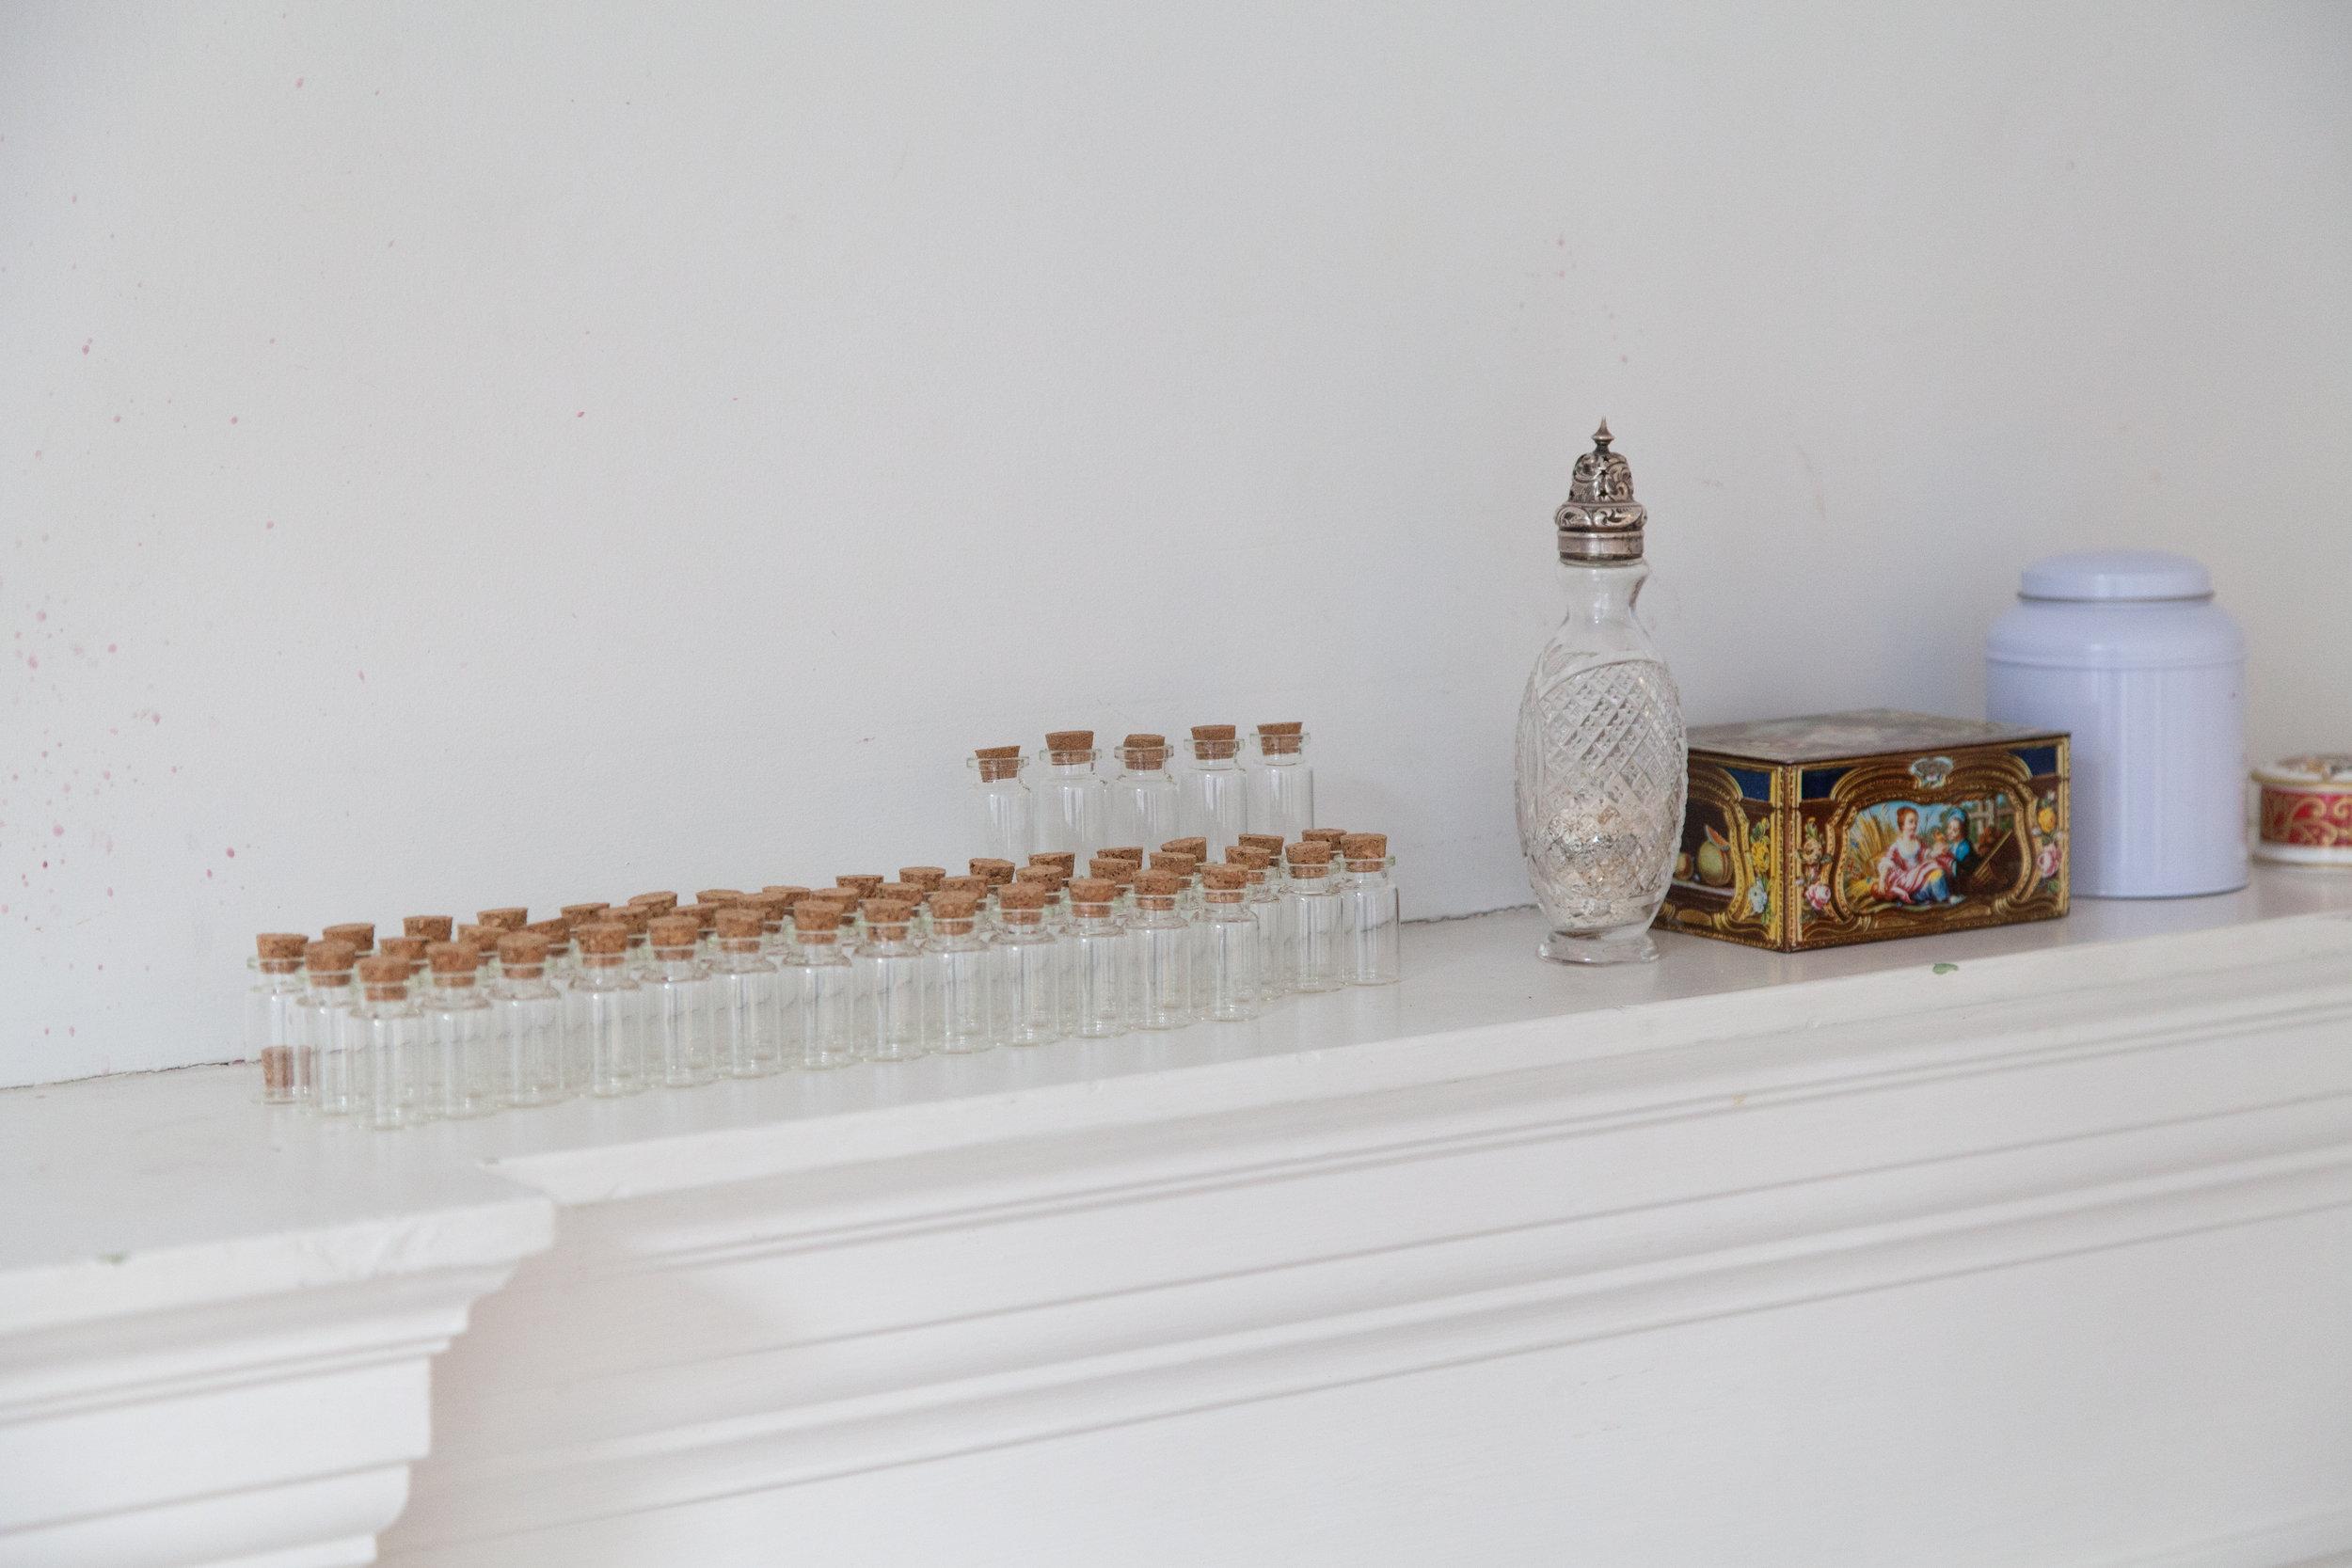 Memento containers, Delfina Foundation, Victoria, London, 2017. Photo: Christian Lübbert